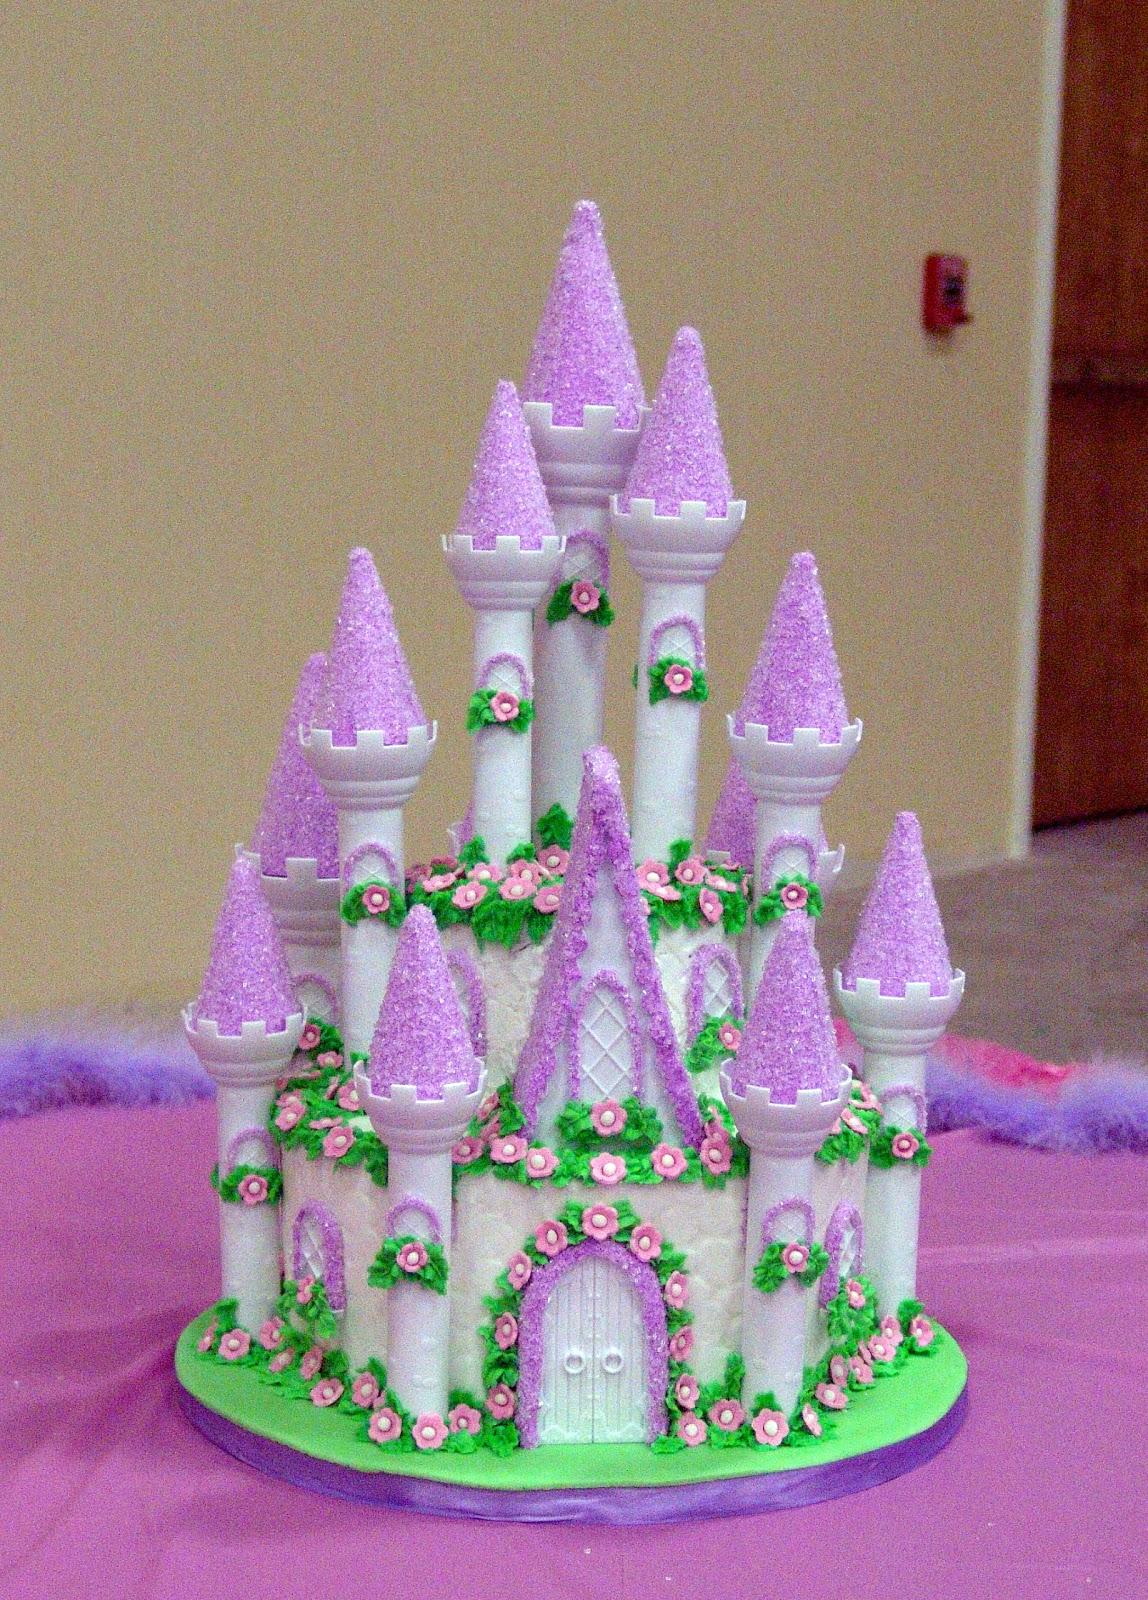 Pictures Of Princess Castle Cake : Deb s Sweet Spot: Princess Castle Cake